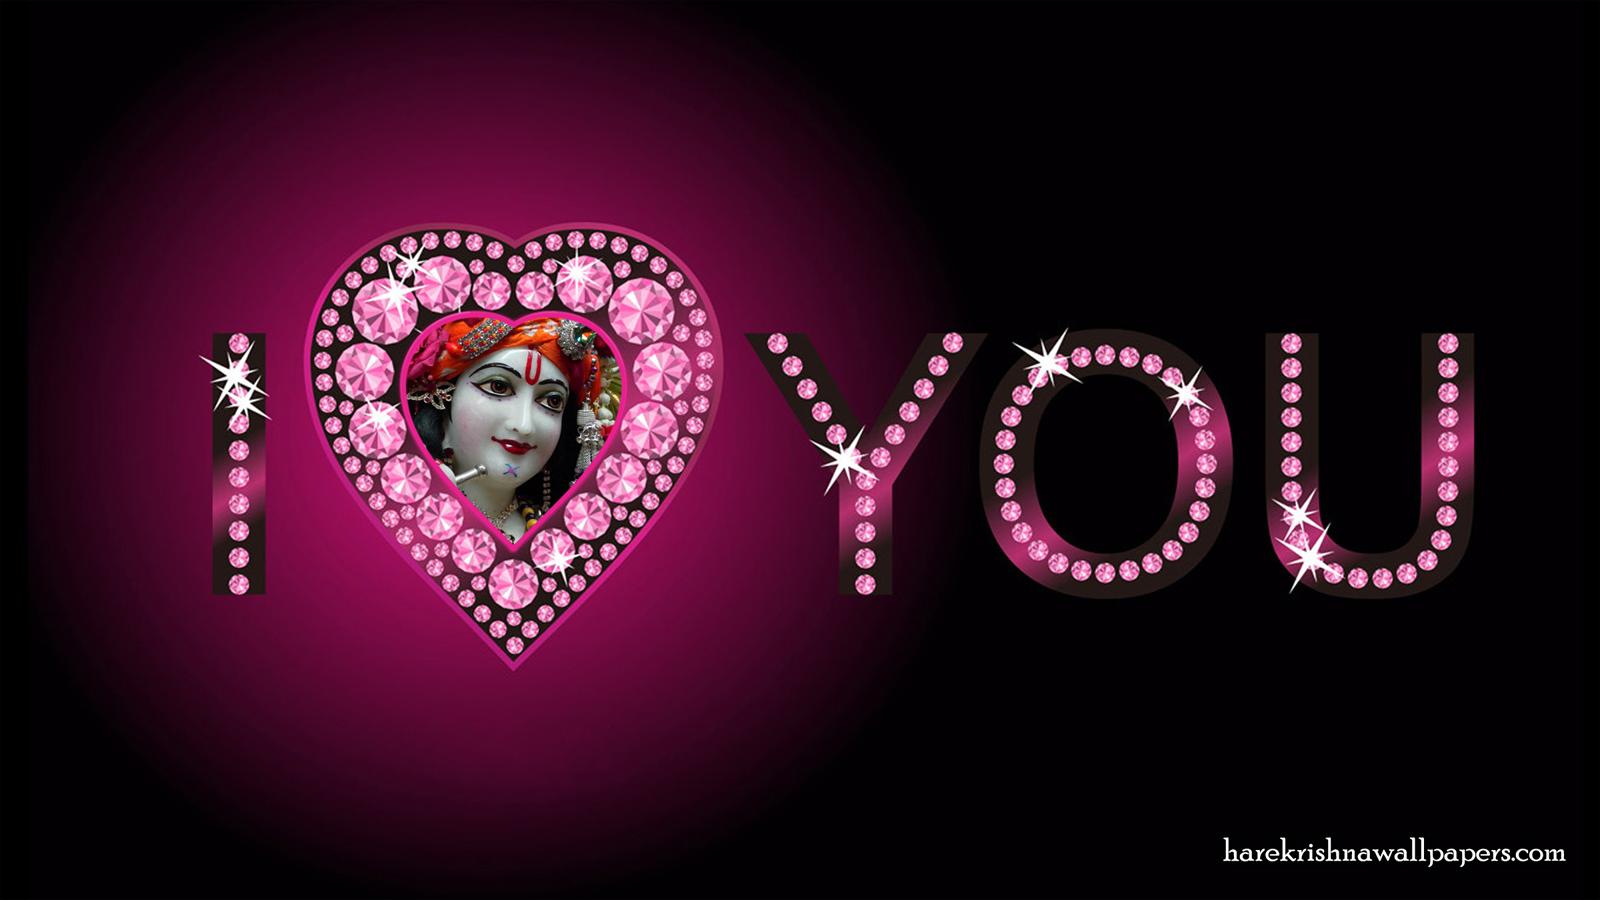 I Love You Giridhari Wallpaper (010) Size 1600x900 Download